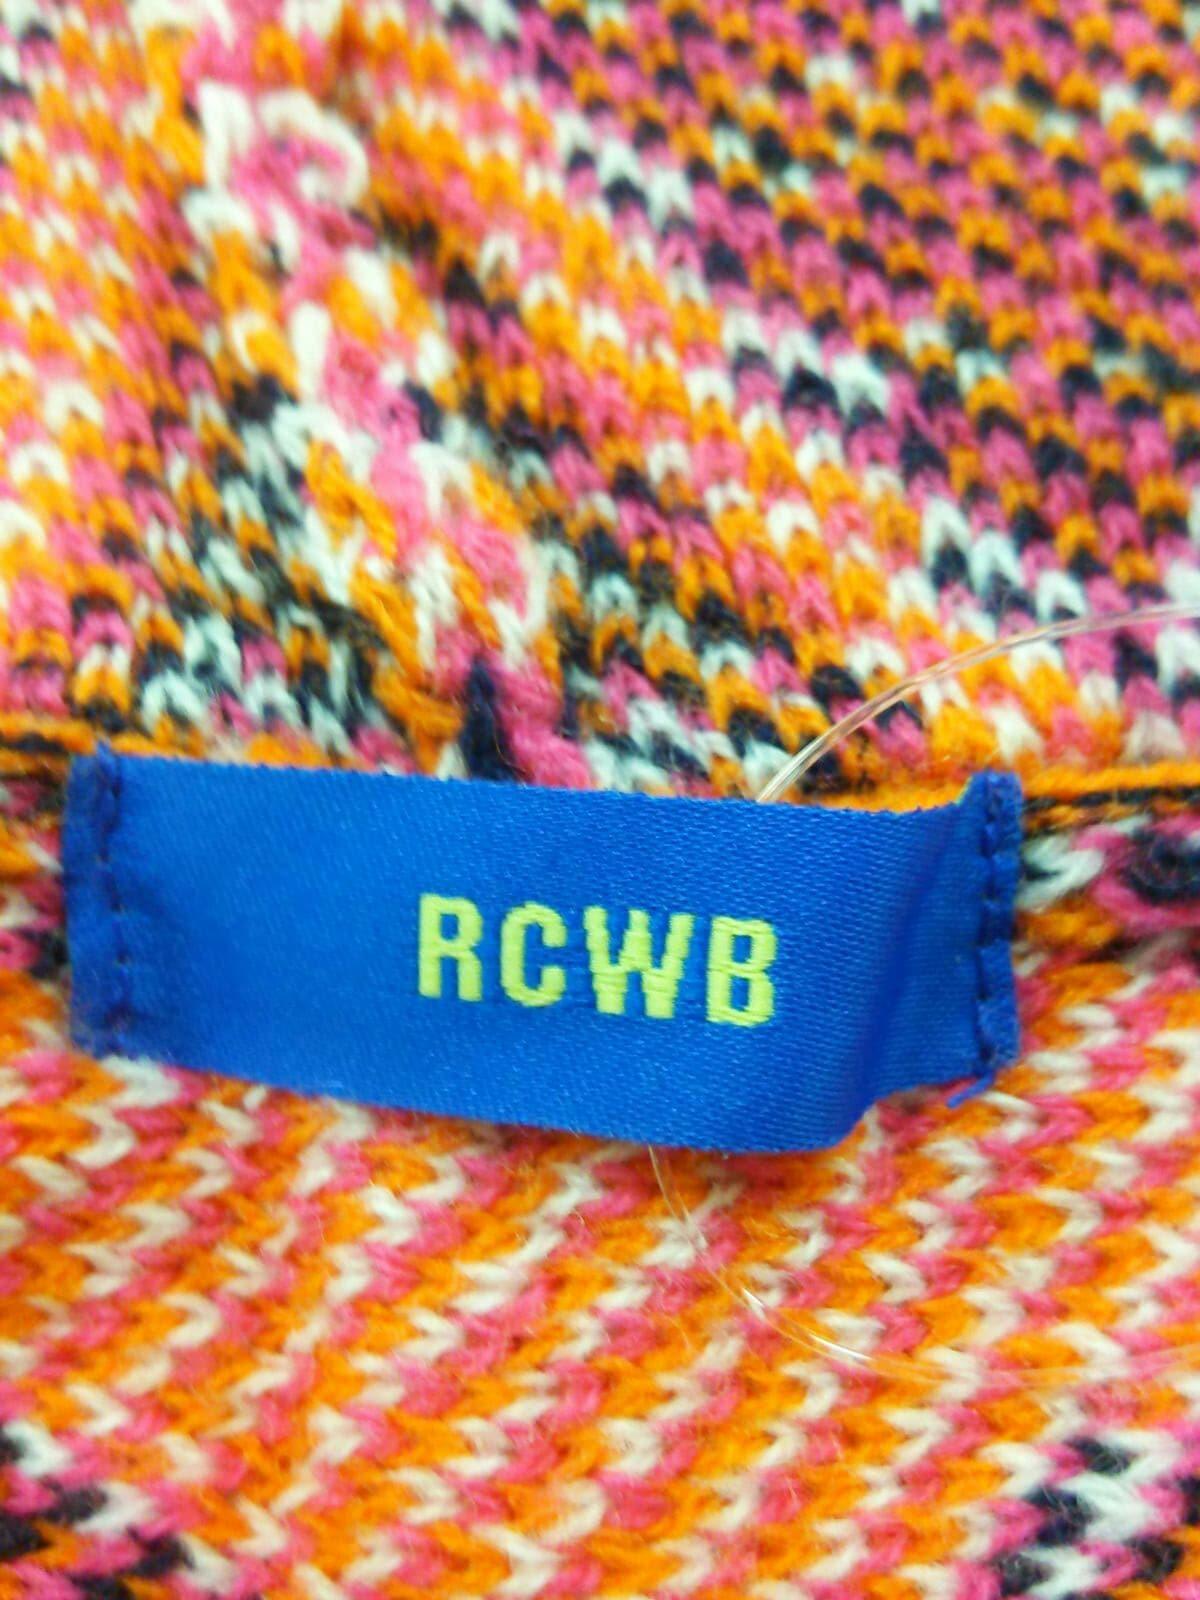 RCWB RODEOCROWNS WIDE BOWL(ロデオクラウンズ)のポンチョ